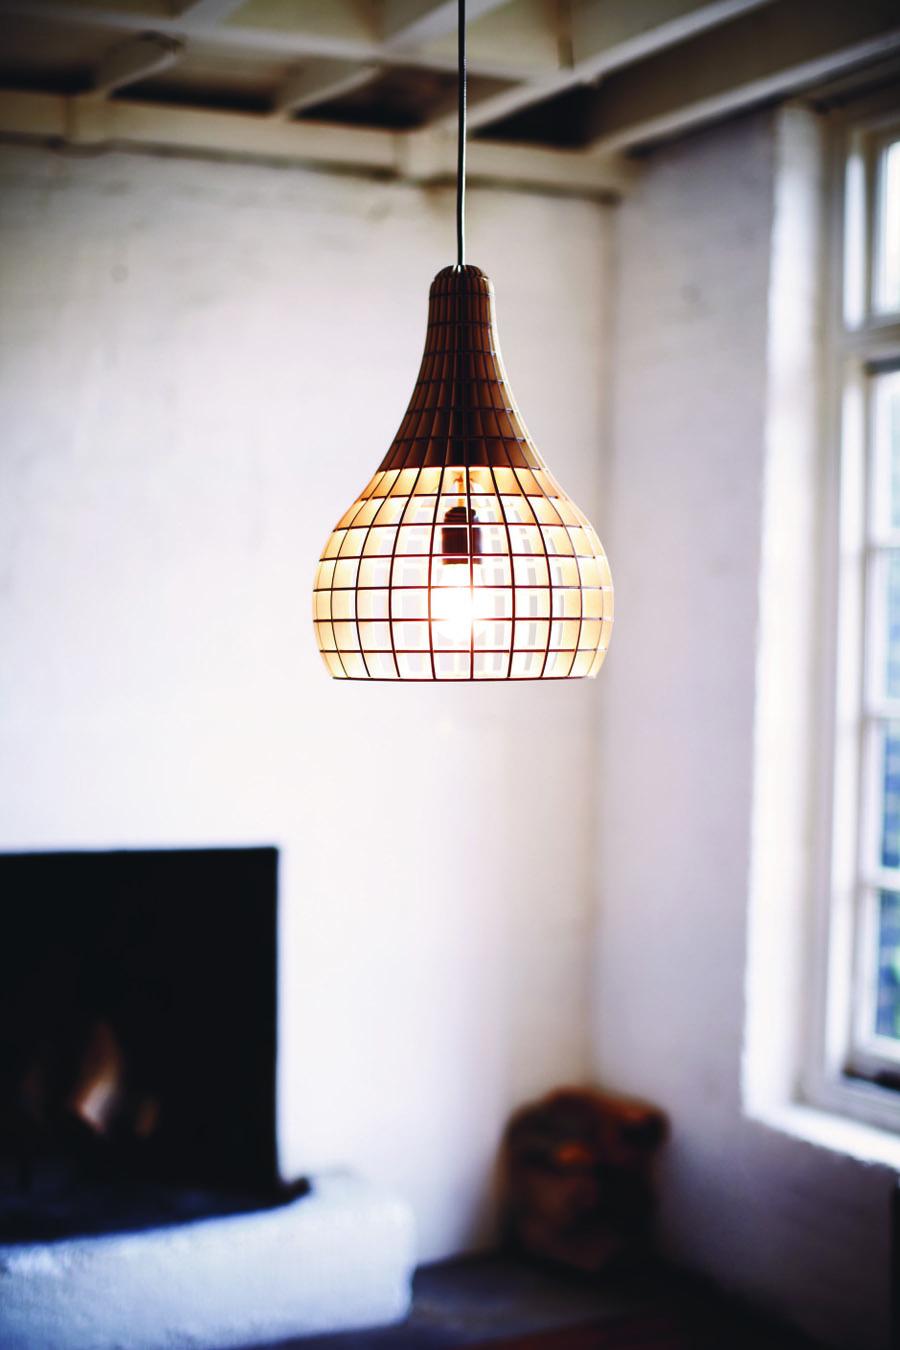 Lighting-Ceiling-lighting-The-Teardrop1-940x1410